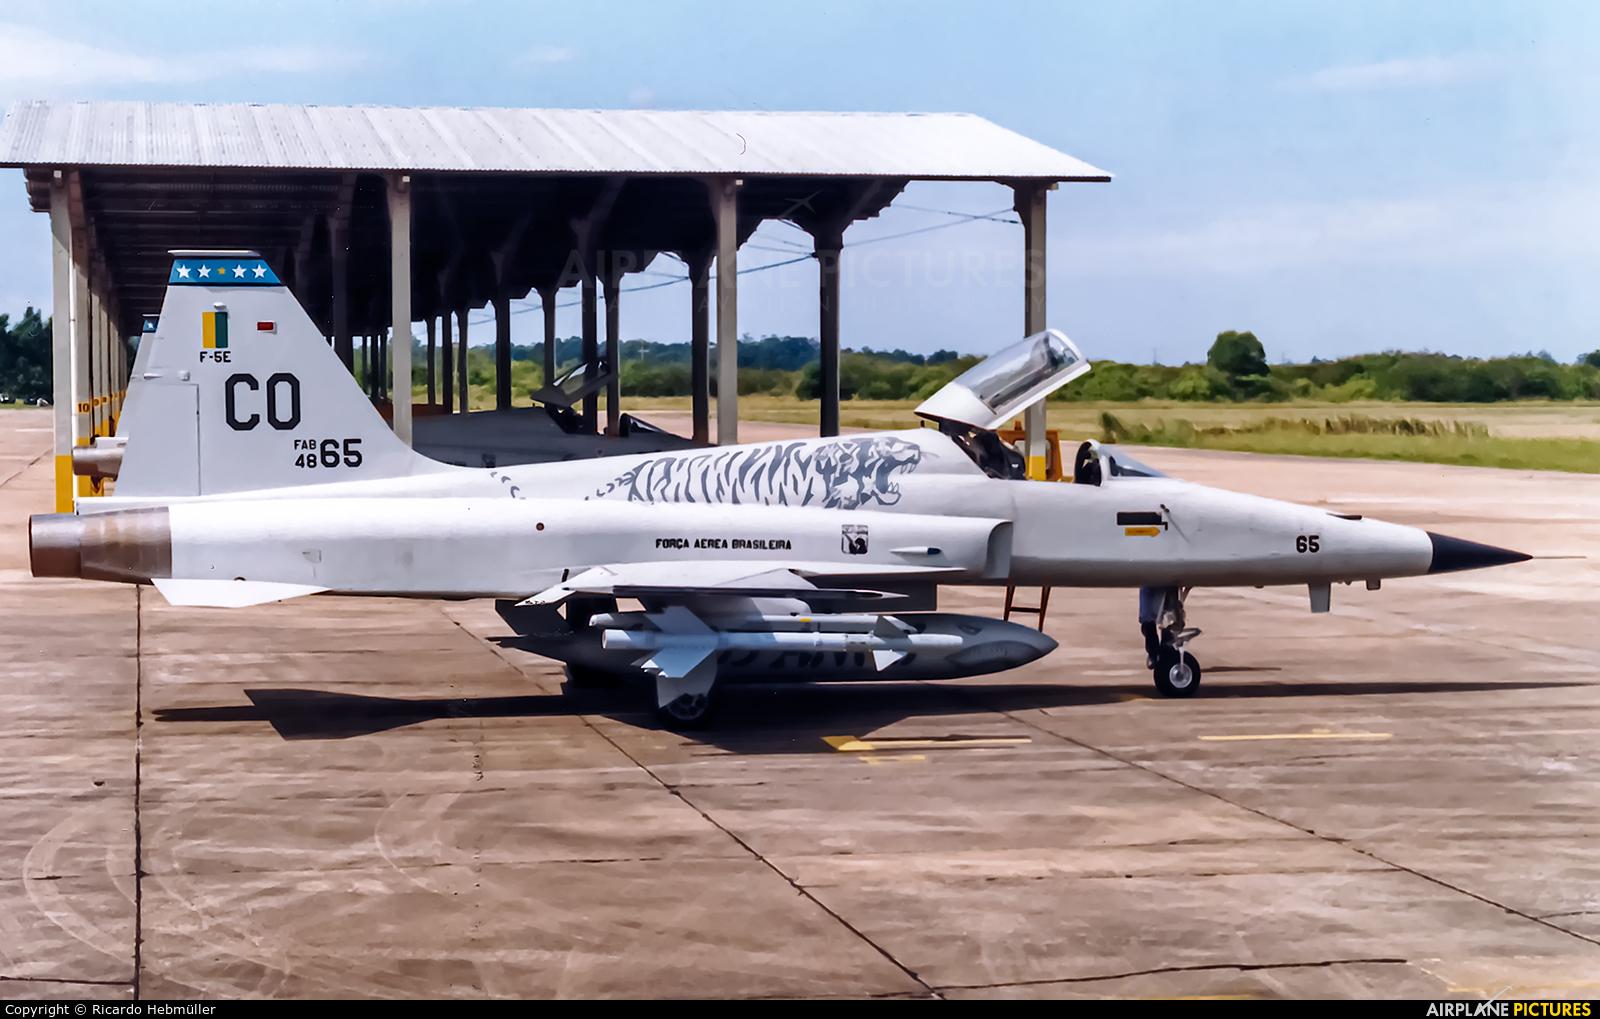 Brazil - Air Force 4865 aircraft at Canoas